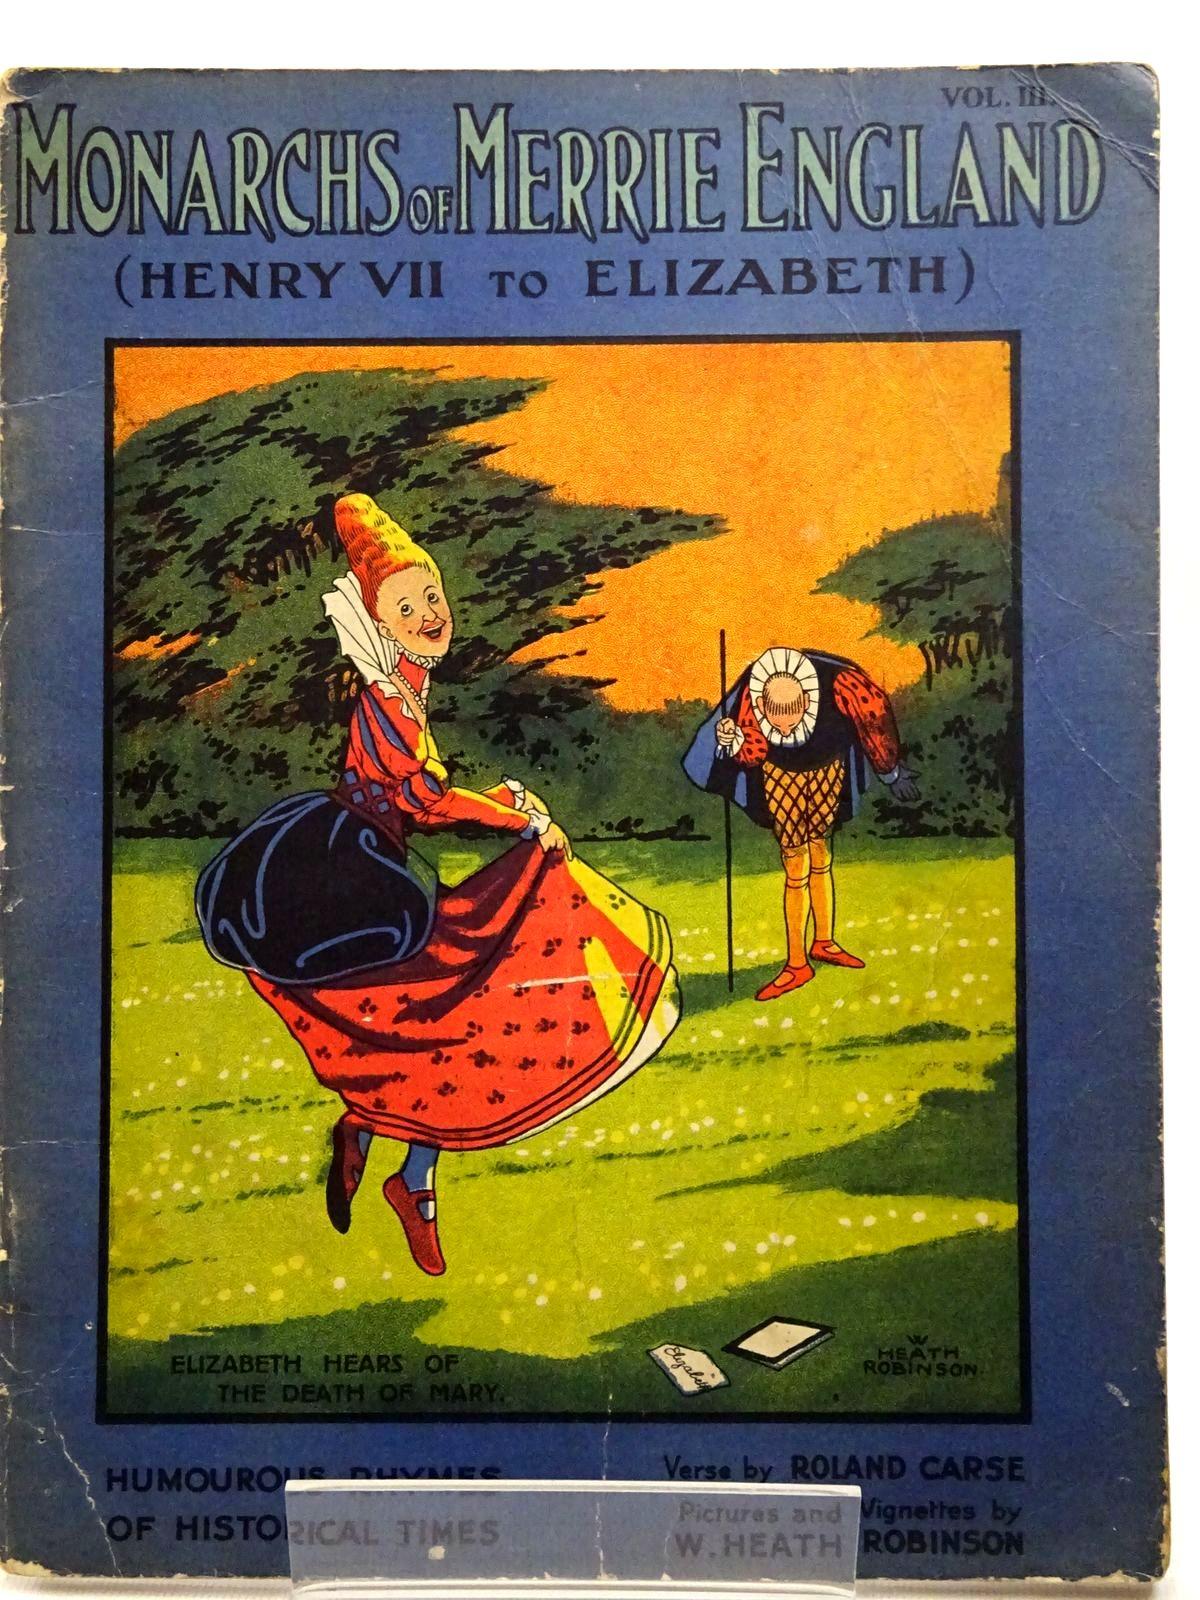 Photo of MONARCHS OF MERRIE ENGLAND VOL III (HENRY VII TO ELIZABETH)